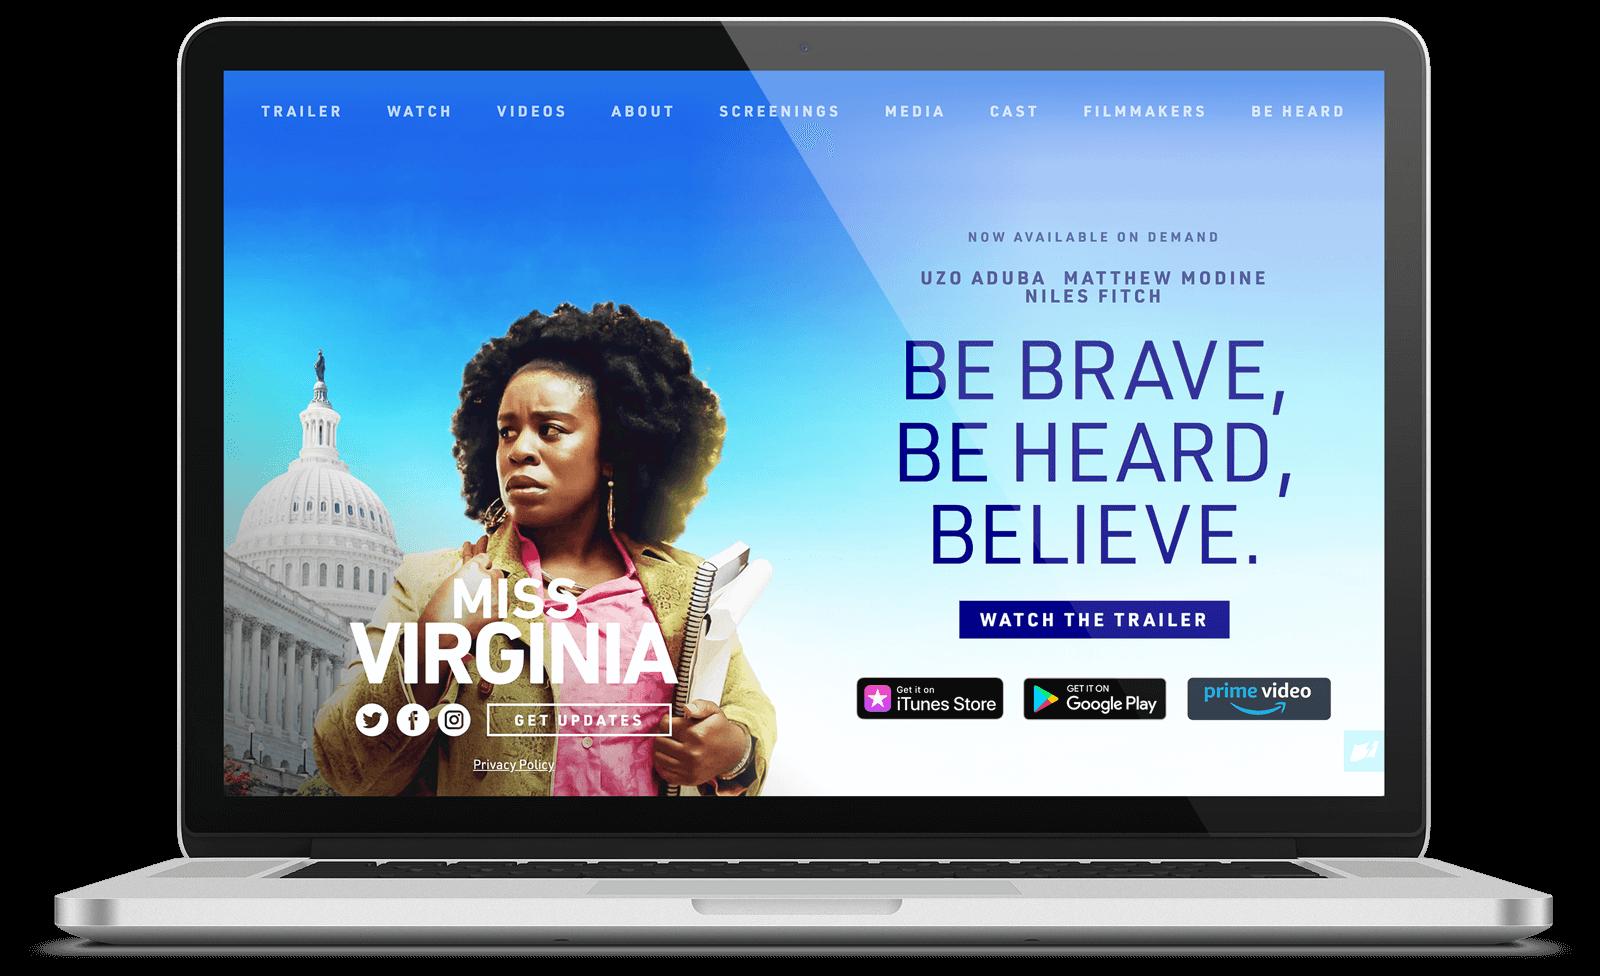 Miss Virginia website